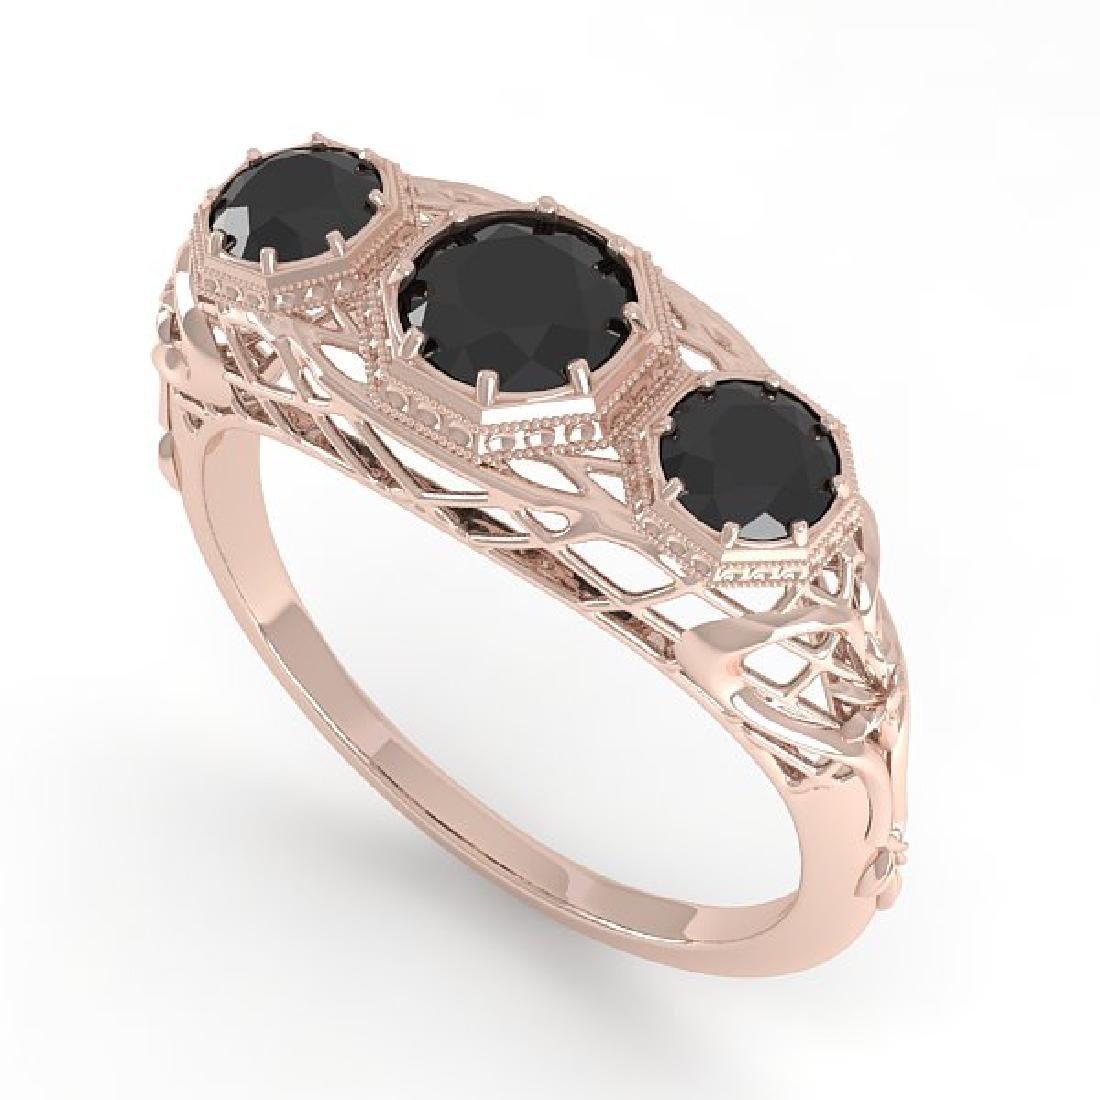 1.00 CTW Black Diamond Art Deco Ring 14K Rose Gold - 2